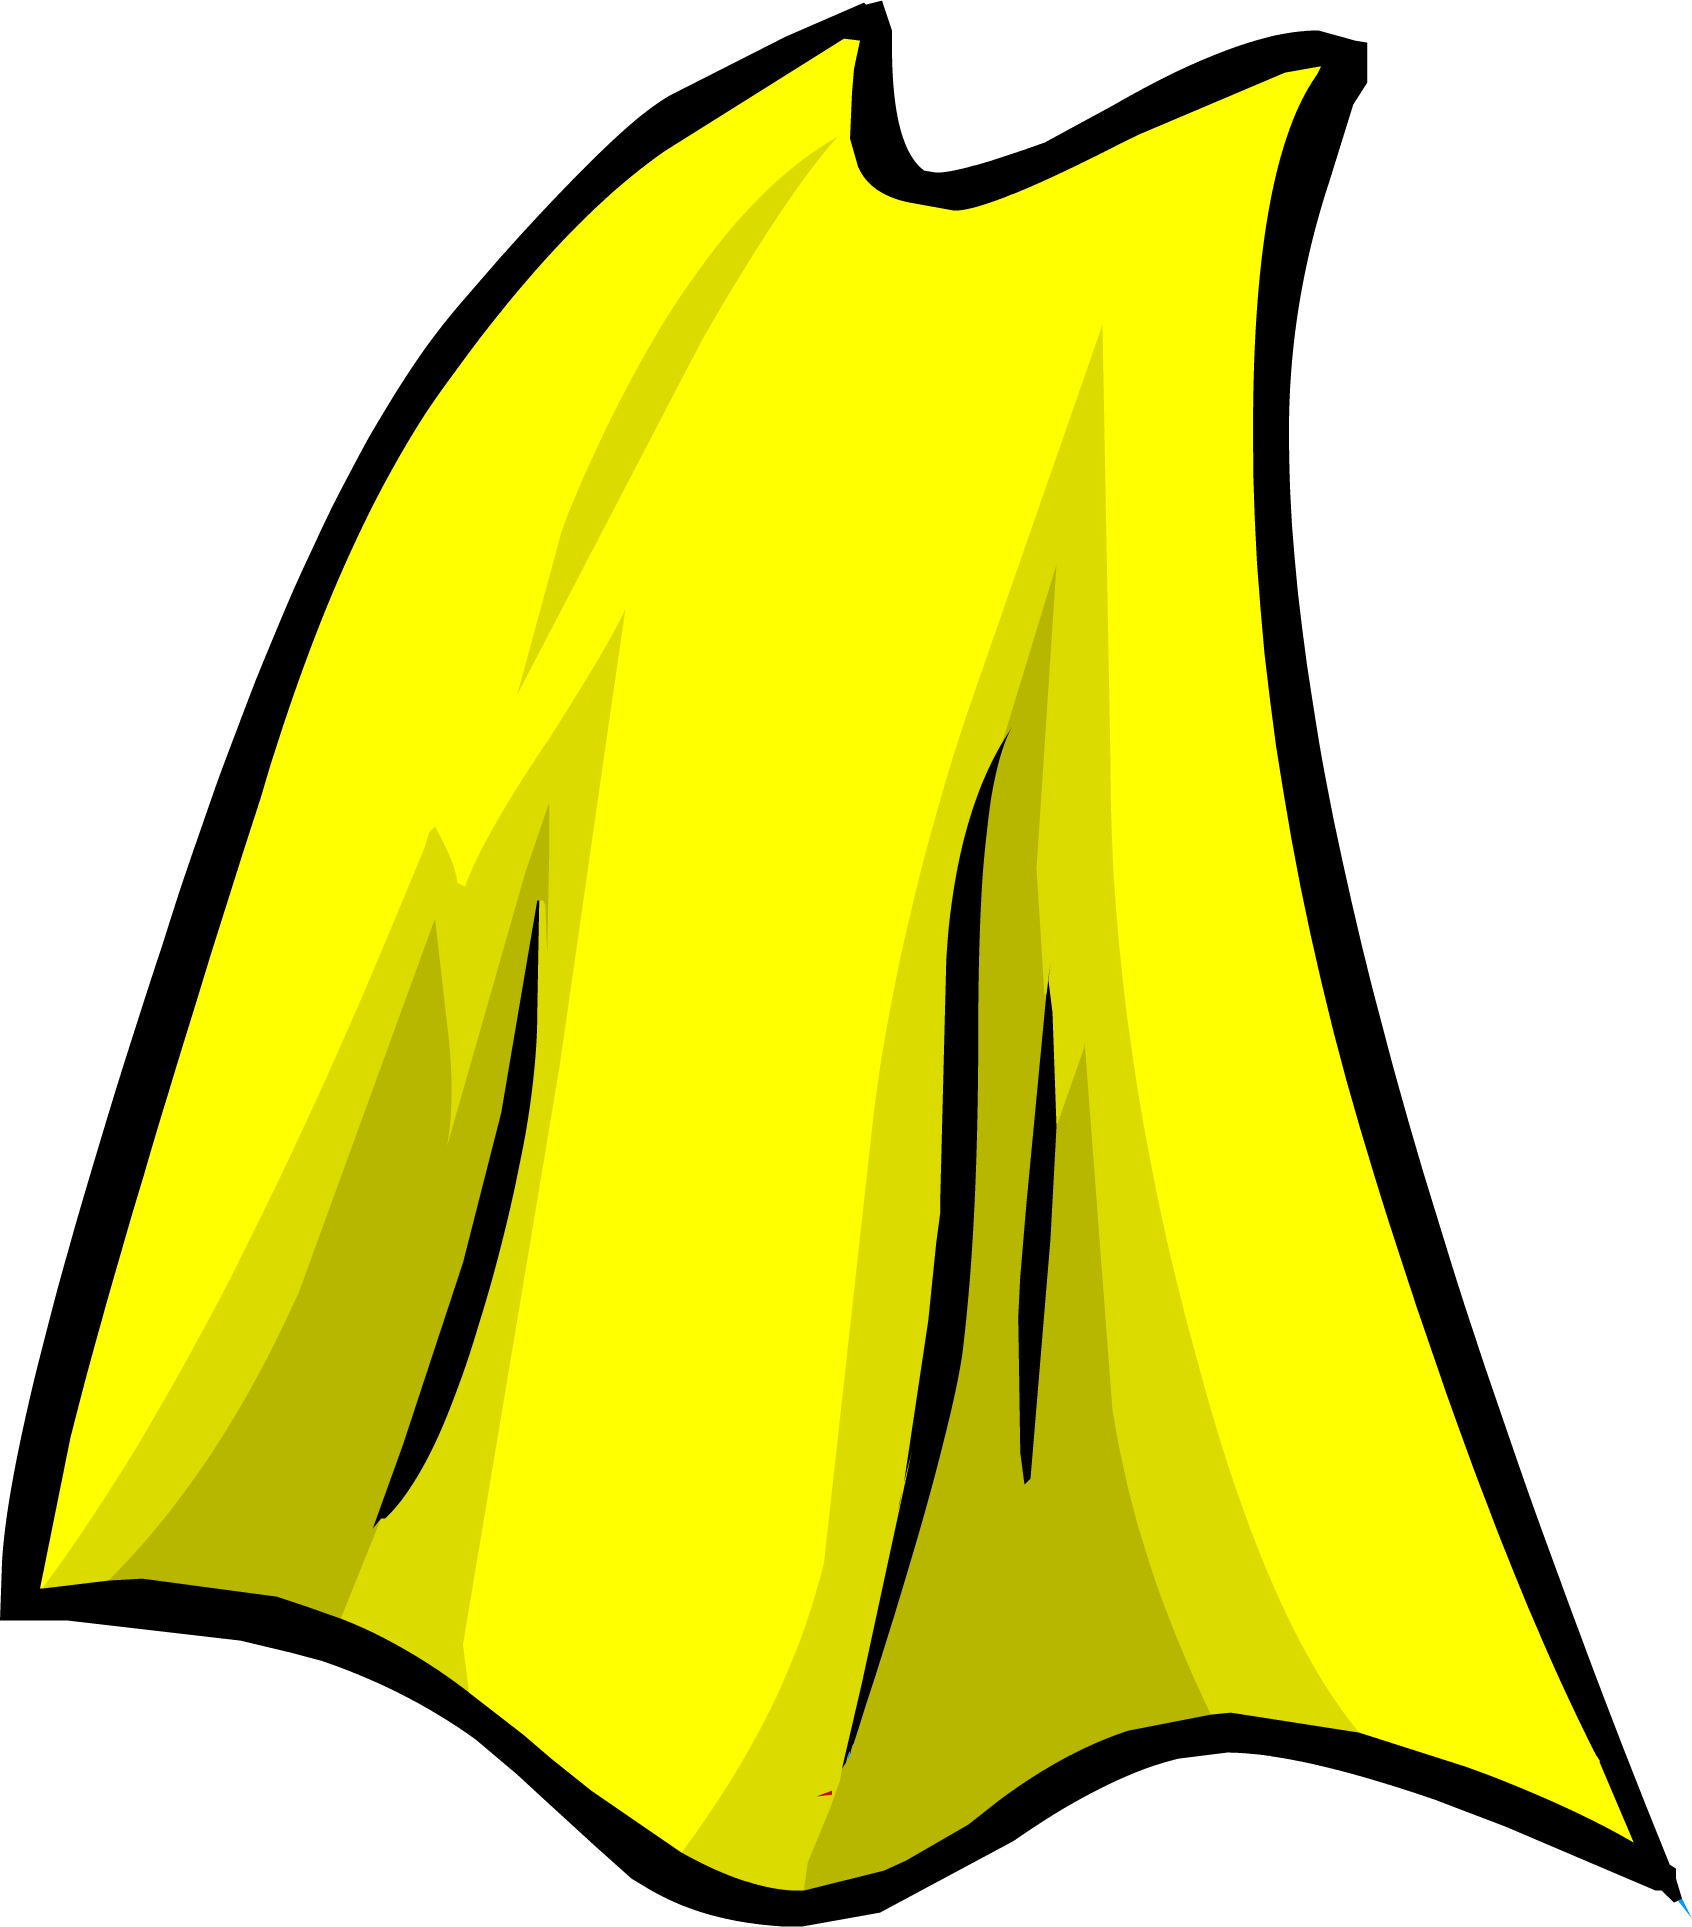 Cape clipart transparent. Image yellowcape png club